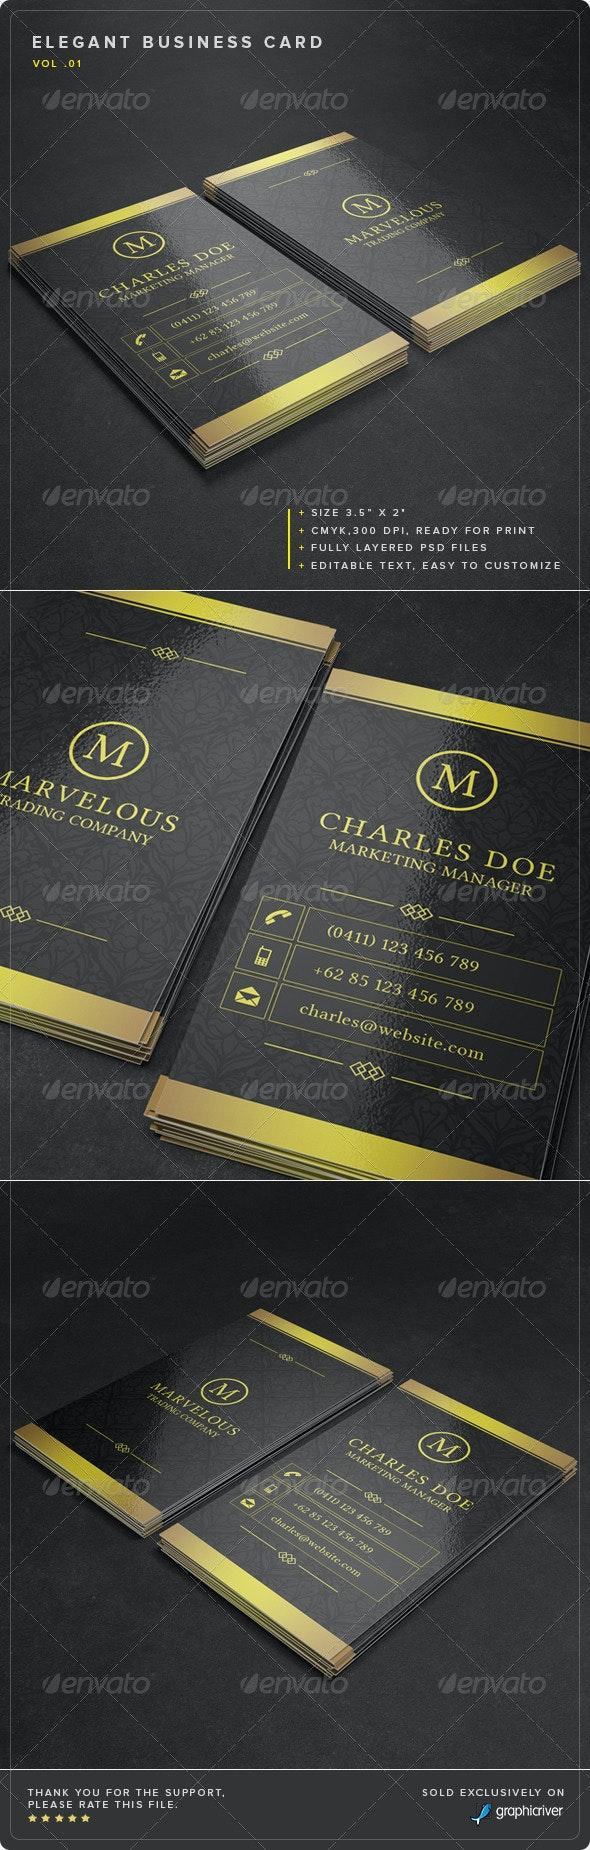 Elegant Business Card Vol. 01 - Corporate Business Cards